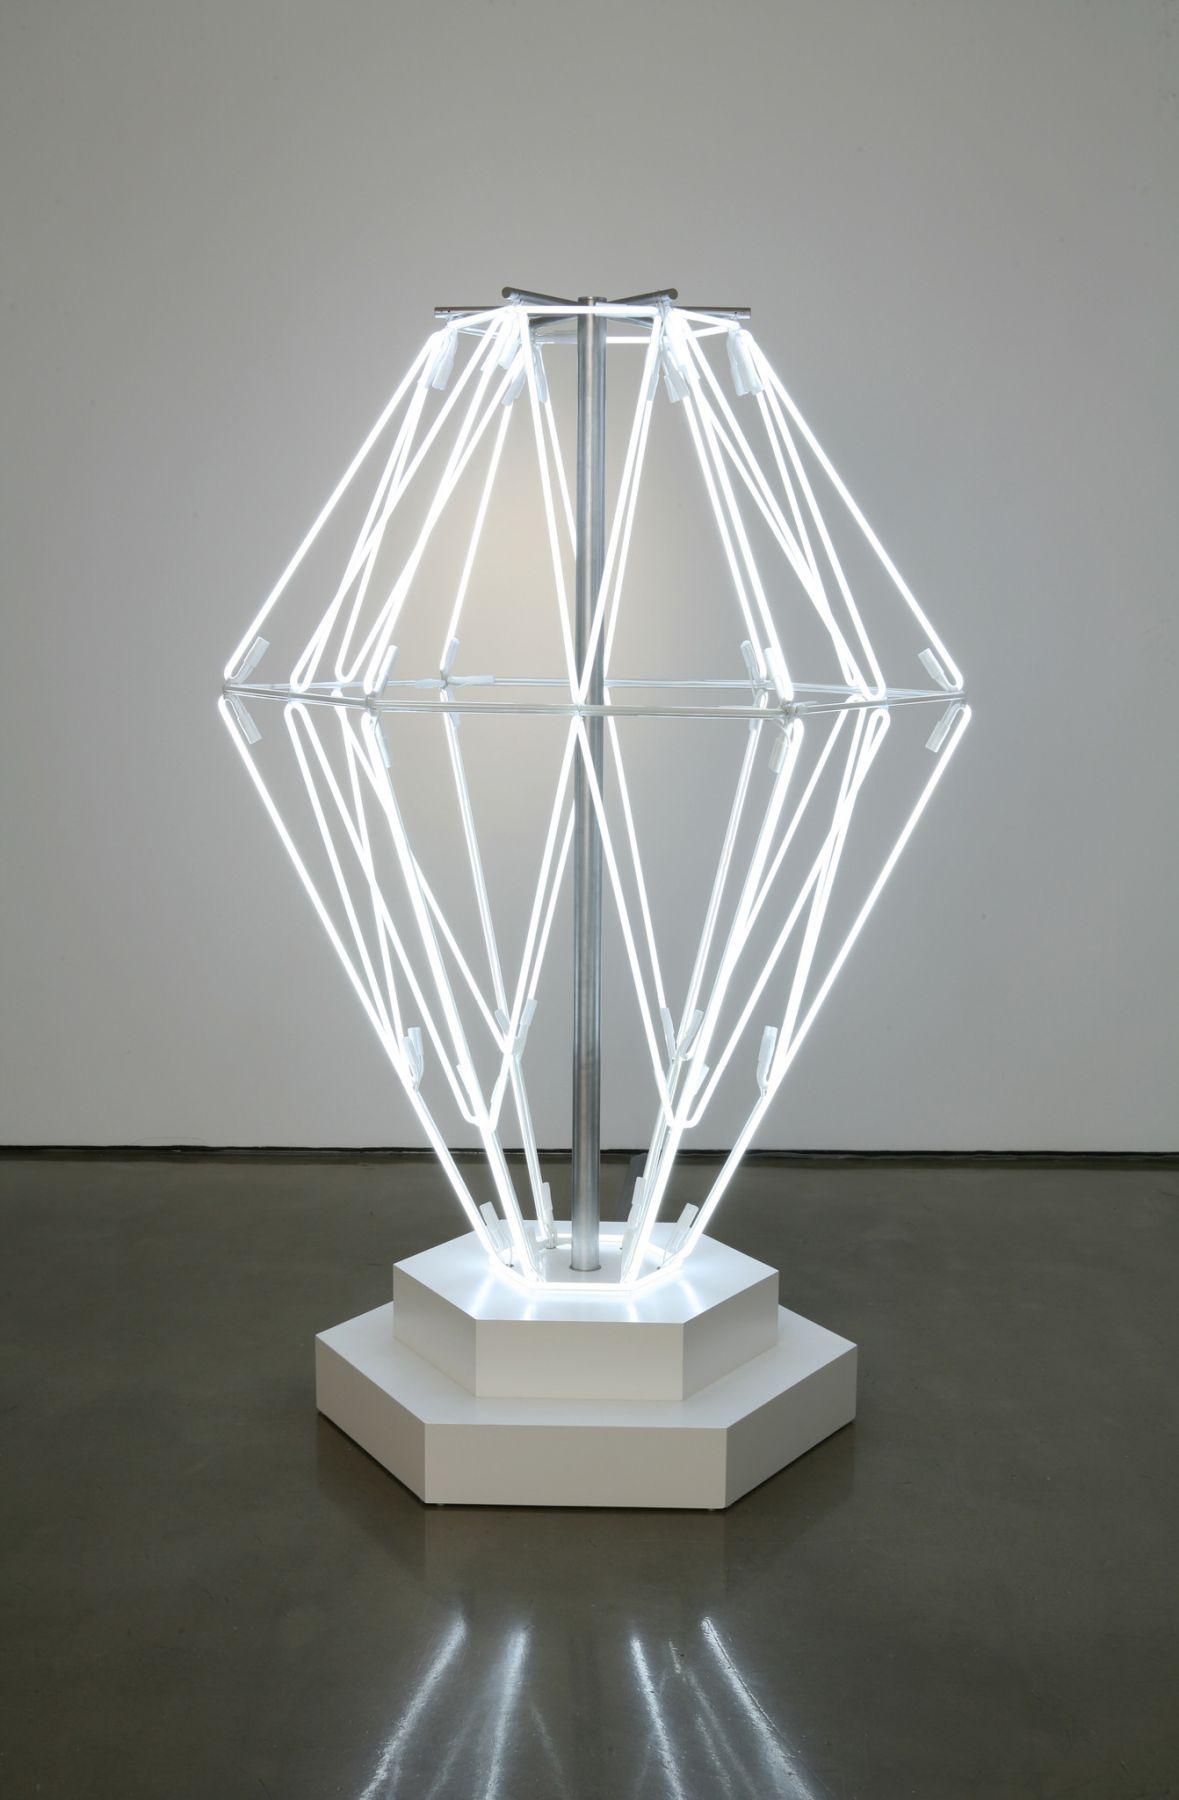 Doug Aitken, beautiful and damned (diamond neon), 2007